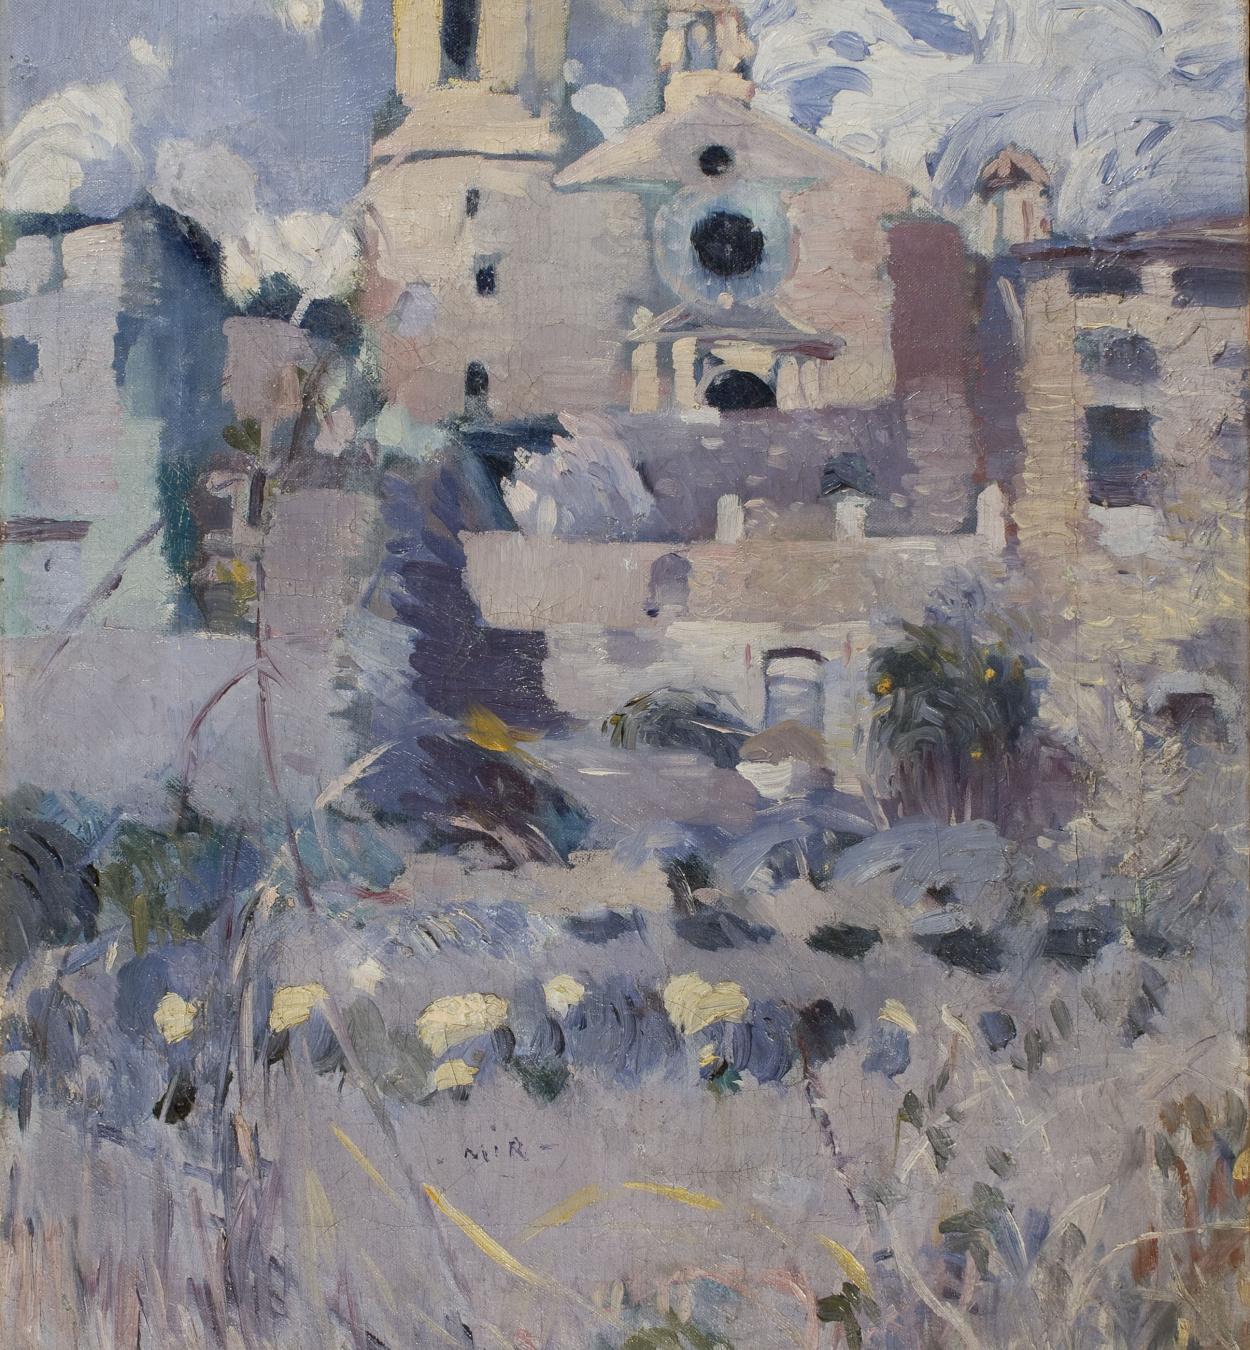 Joaquim Mir - The Parish Church of Maspujols - 1907-1910